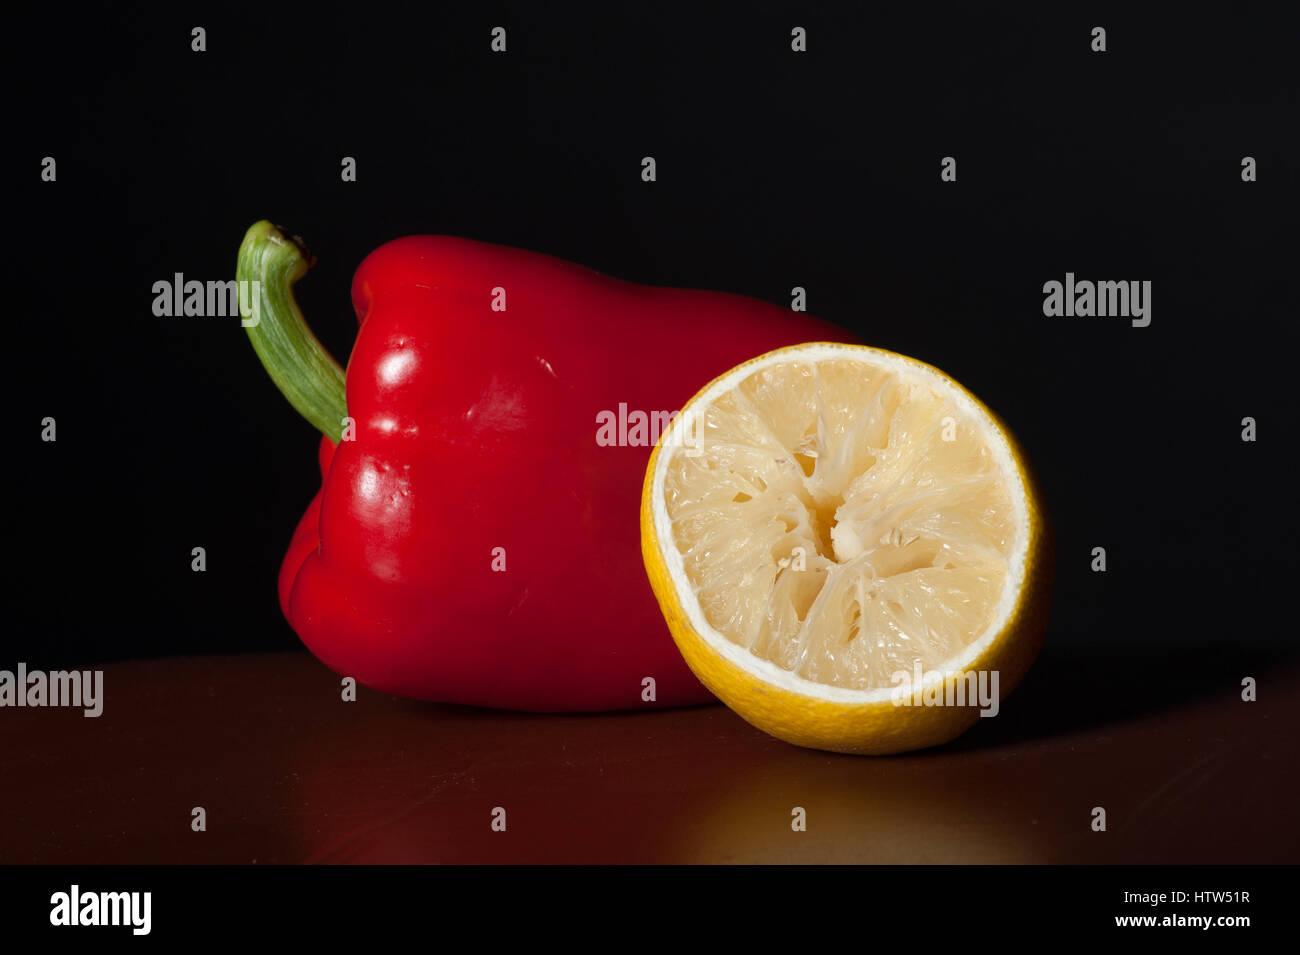 Red pepper and lemon. - Stock Image